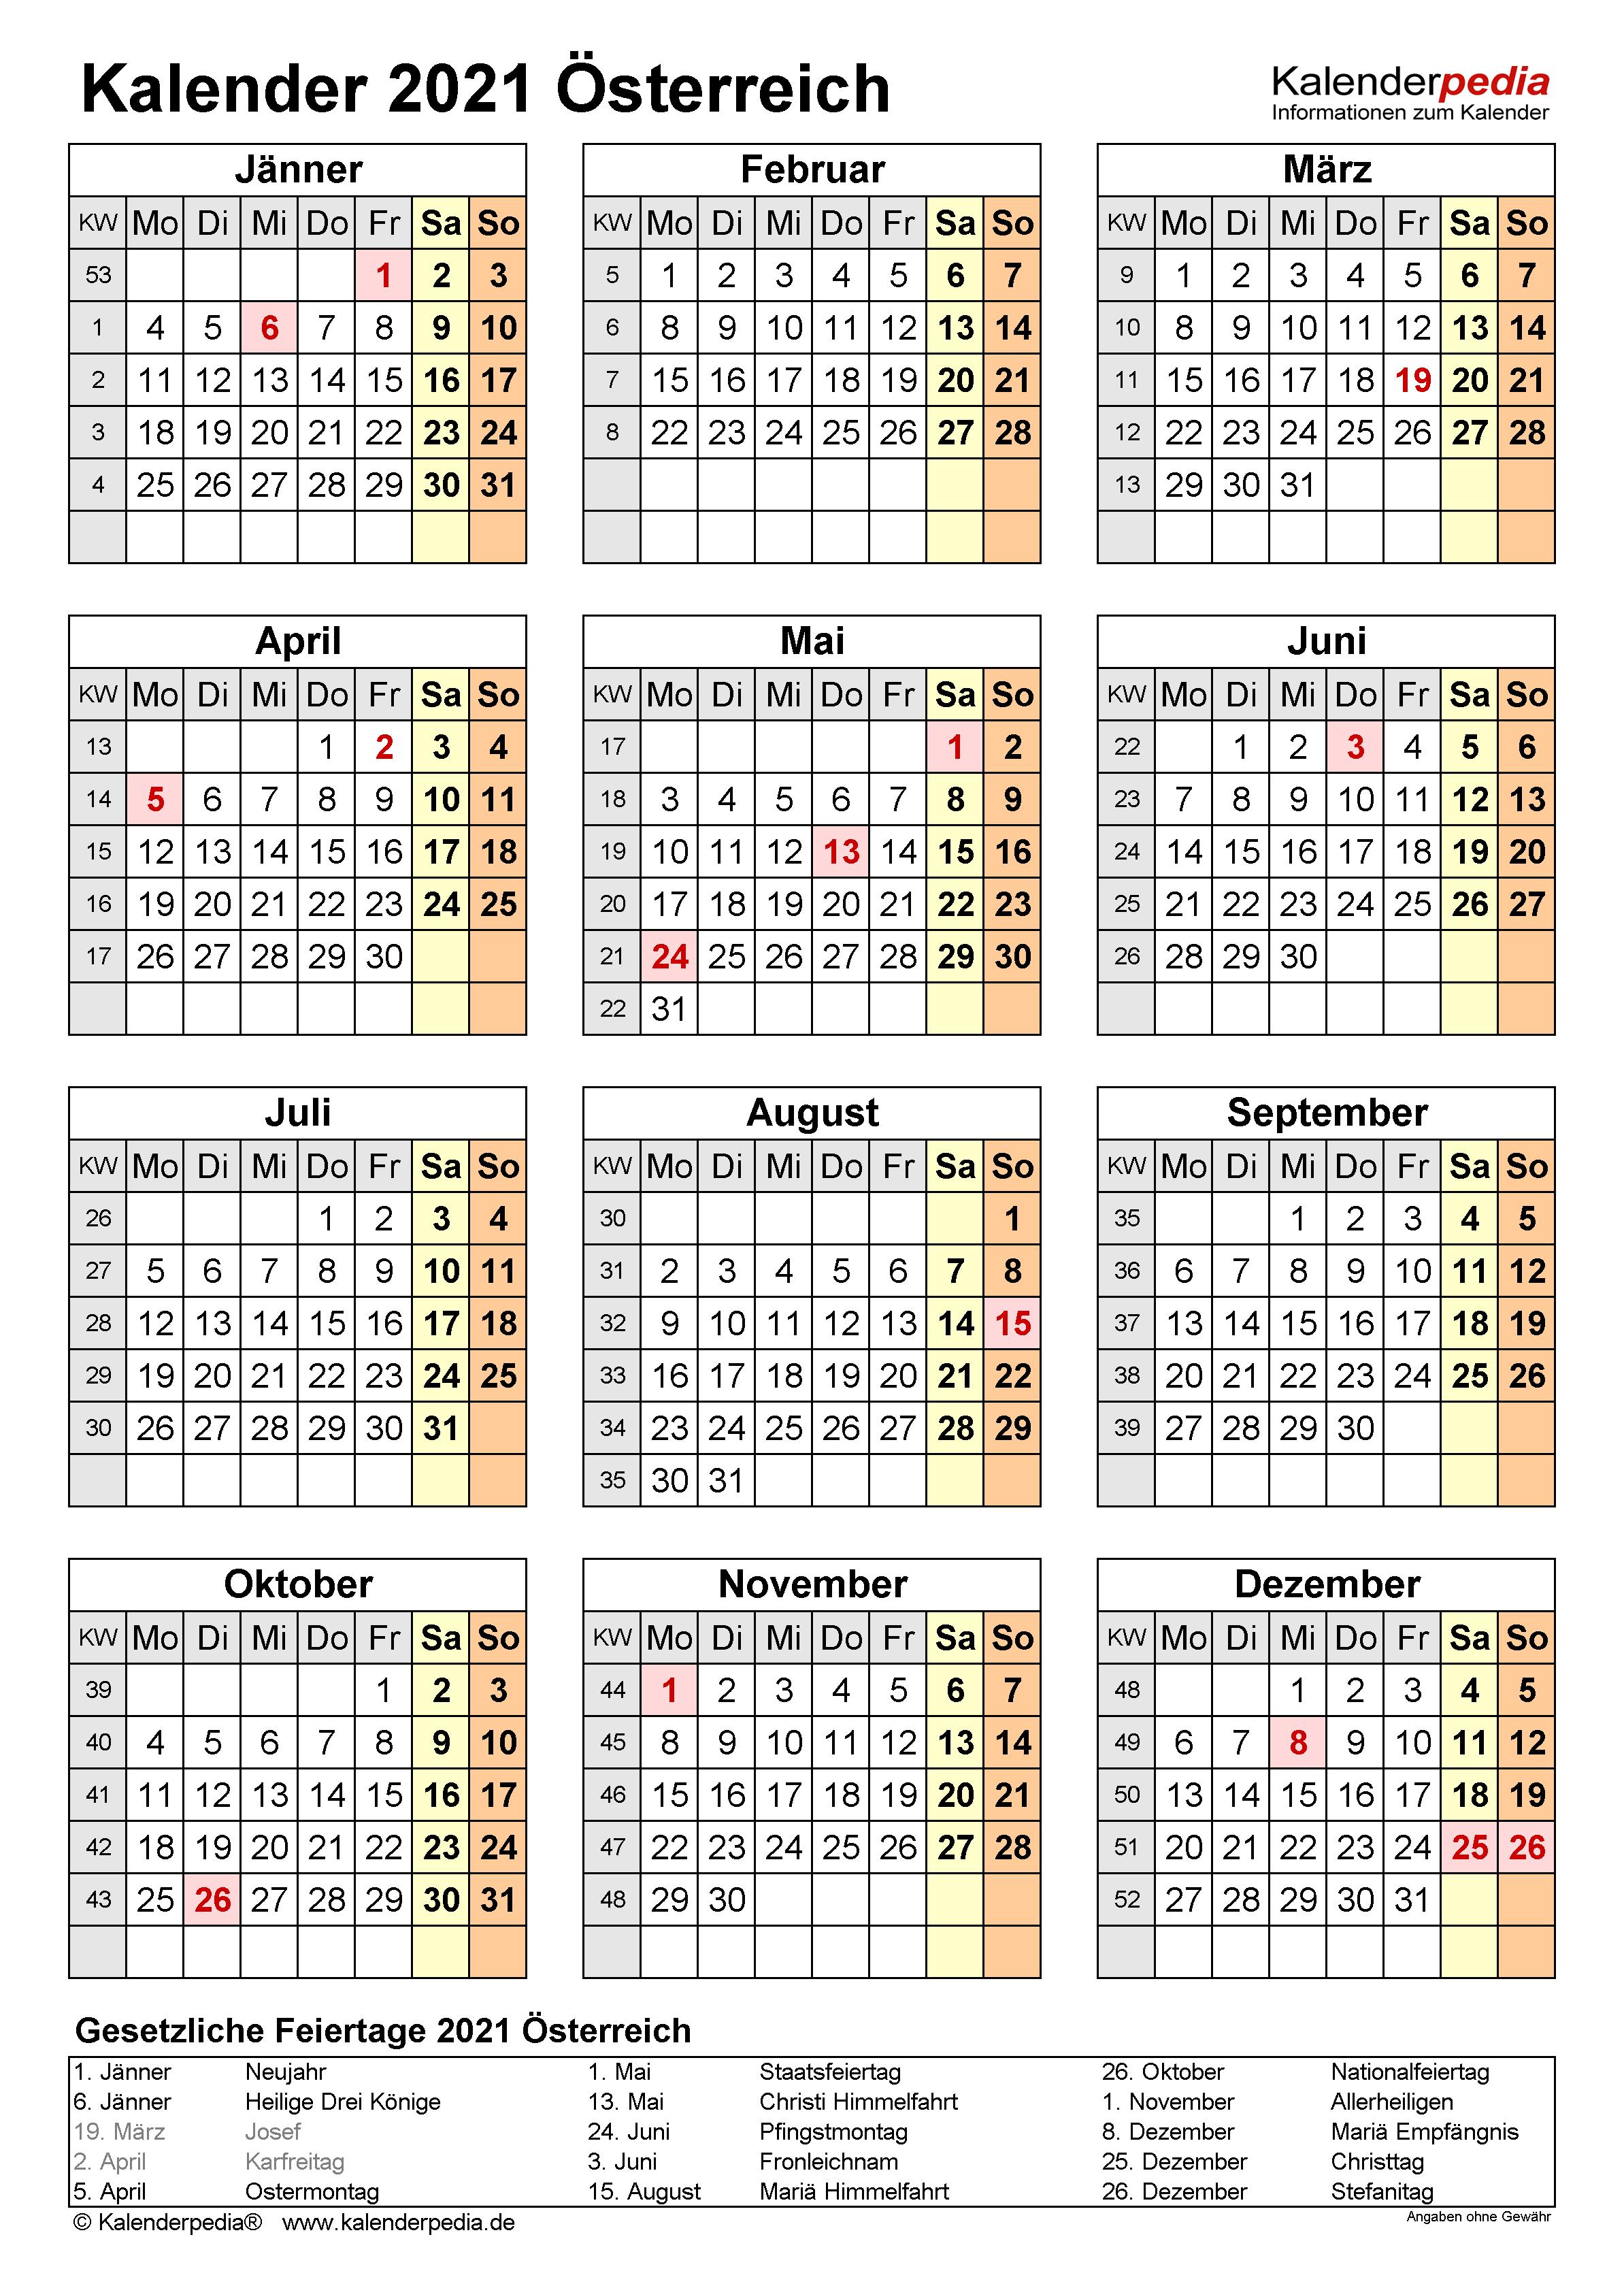 Kalender 2021 Mit Kalenderwochen Pdf